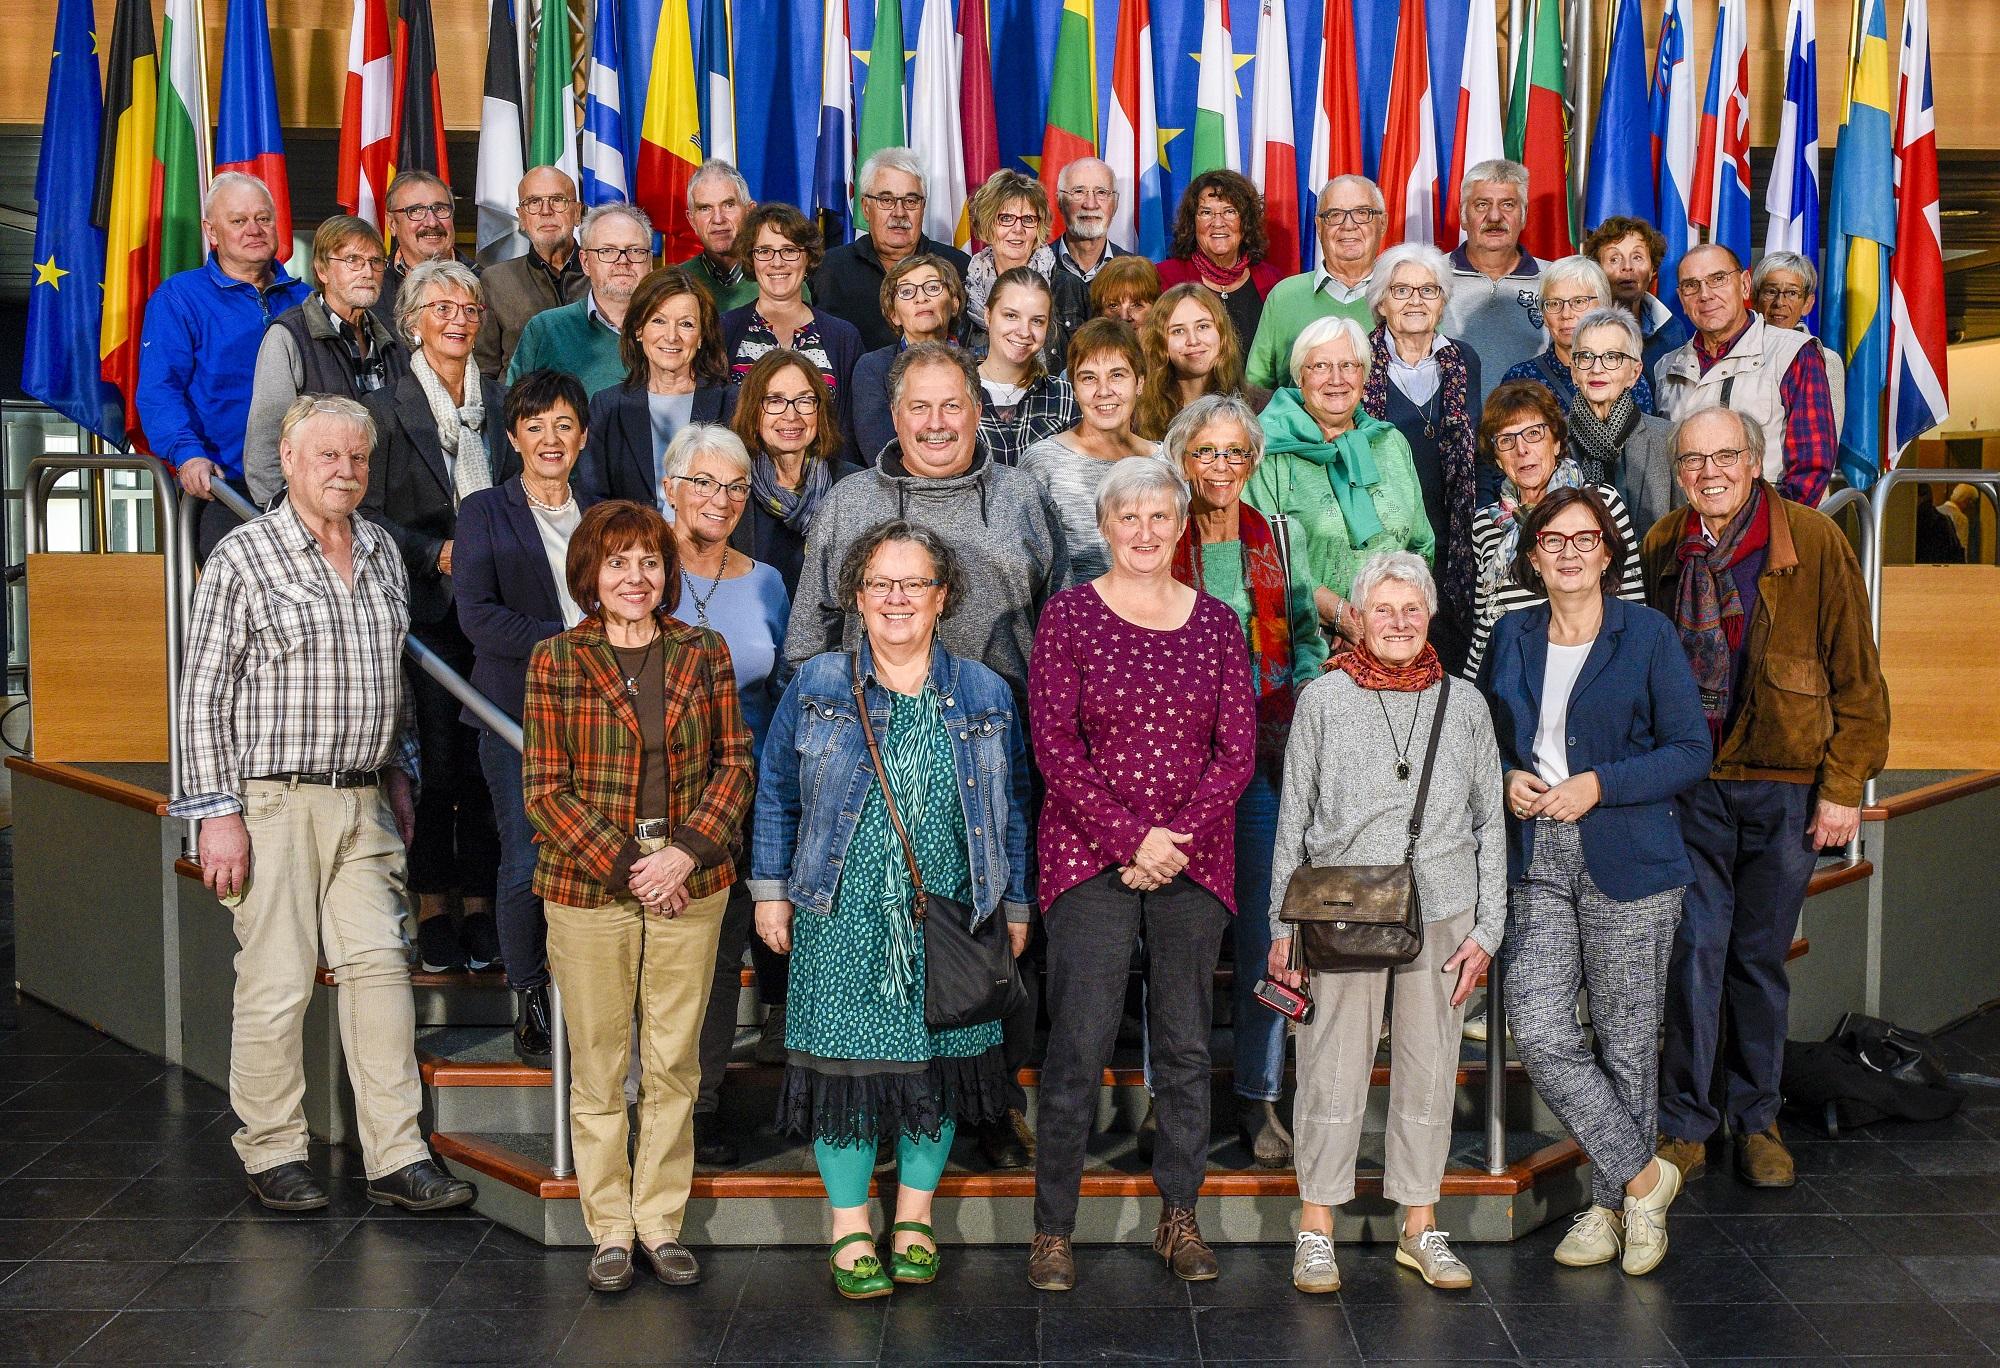 Besuchergruppe Straßburg Birgit Sippel Oktober 2019